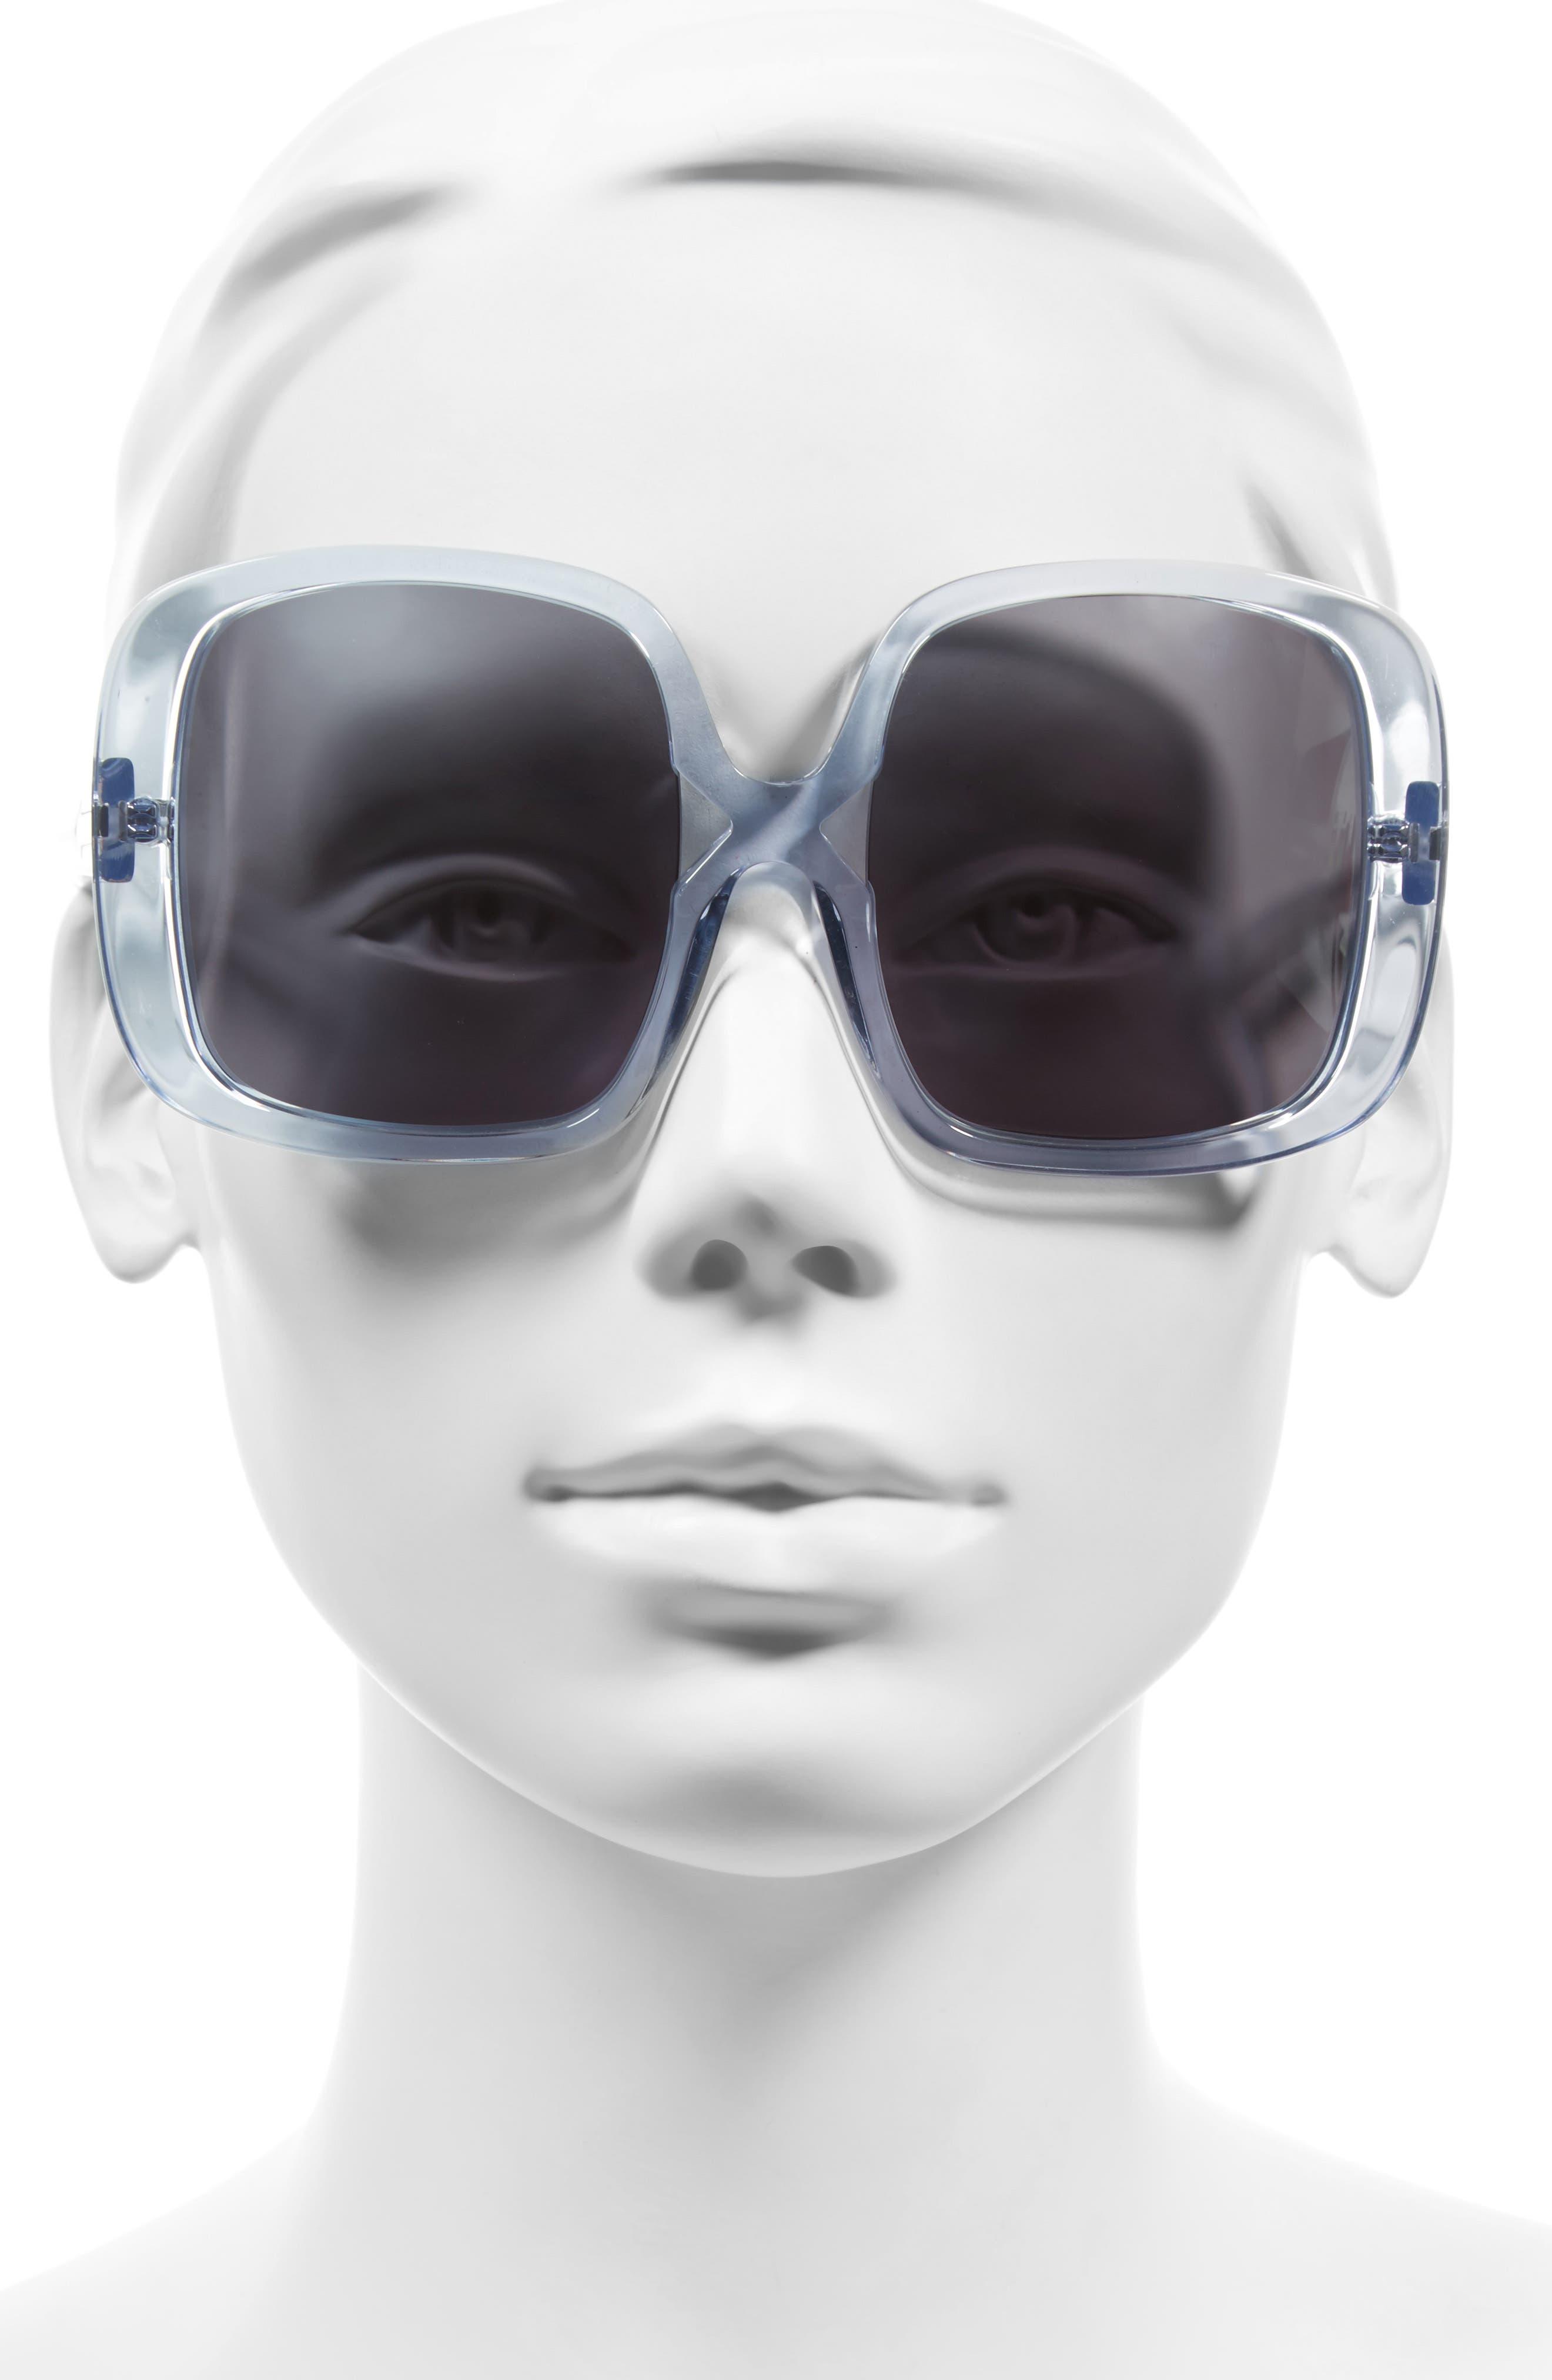 Marques 55mm Square Sunglasses,                             Alternate thumbnail 2, color,                             040